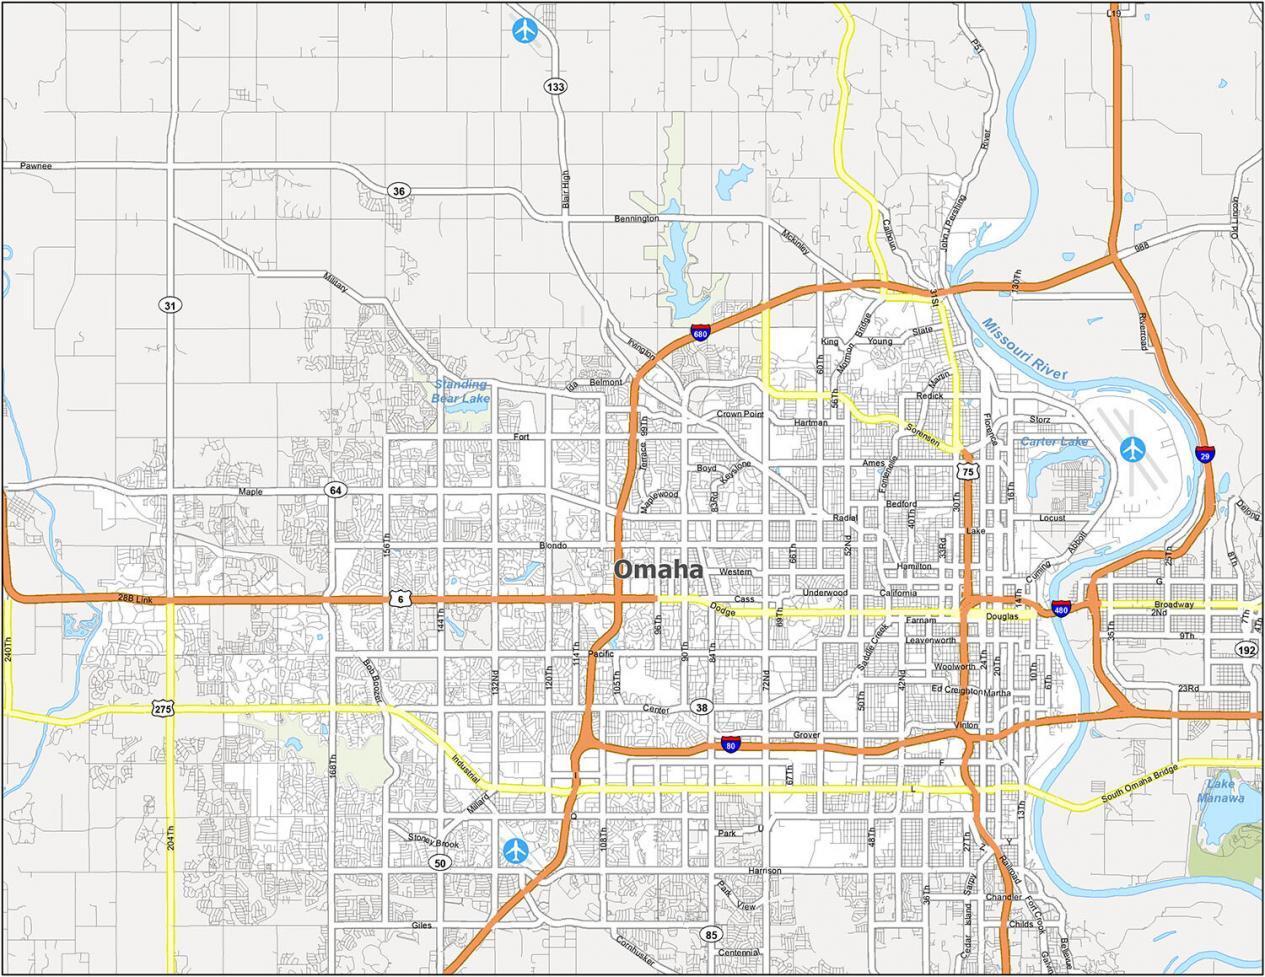 Omaha Road Map